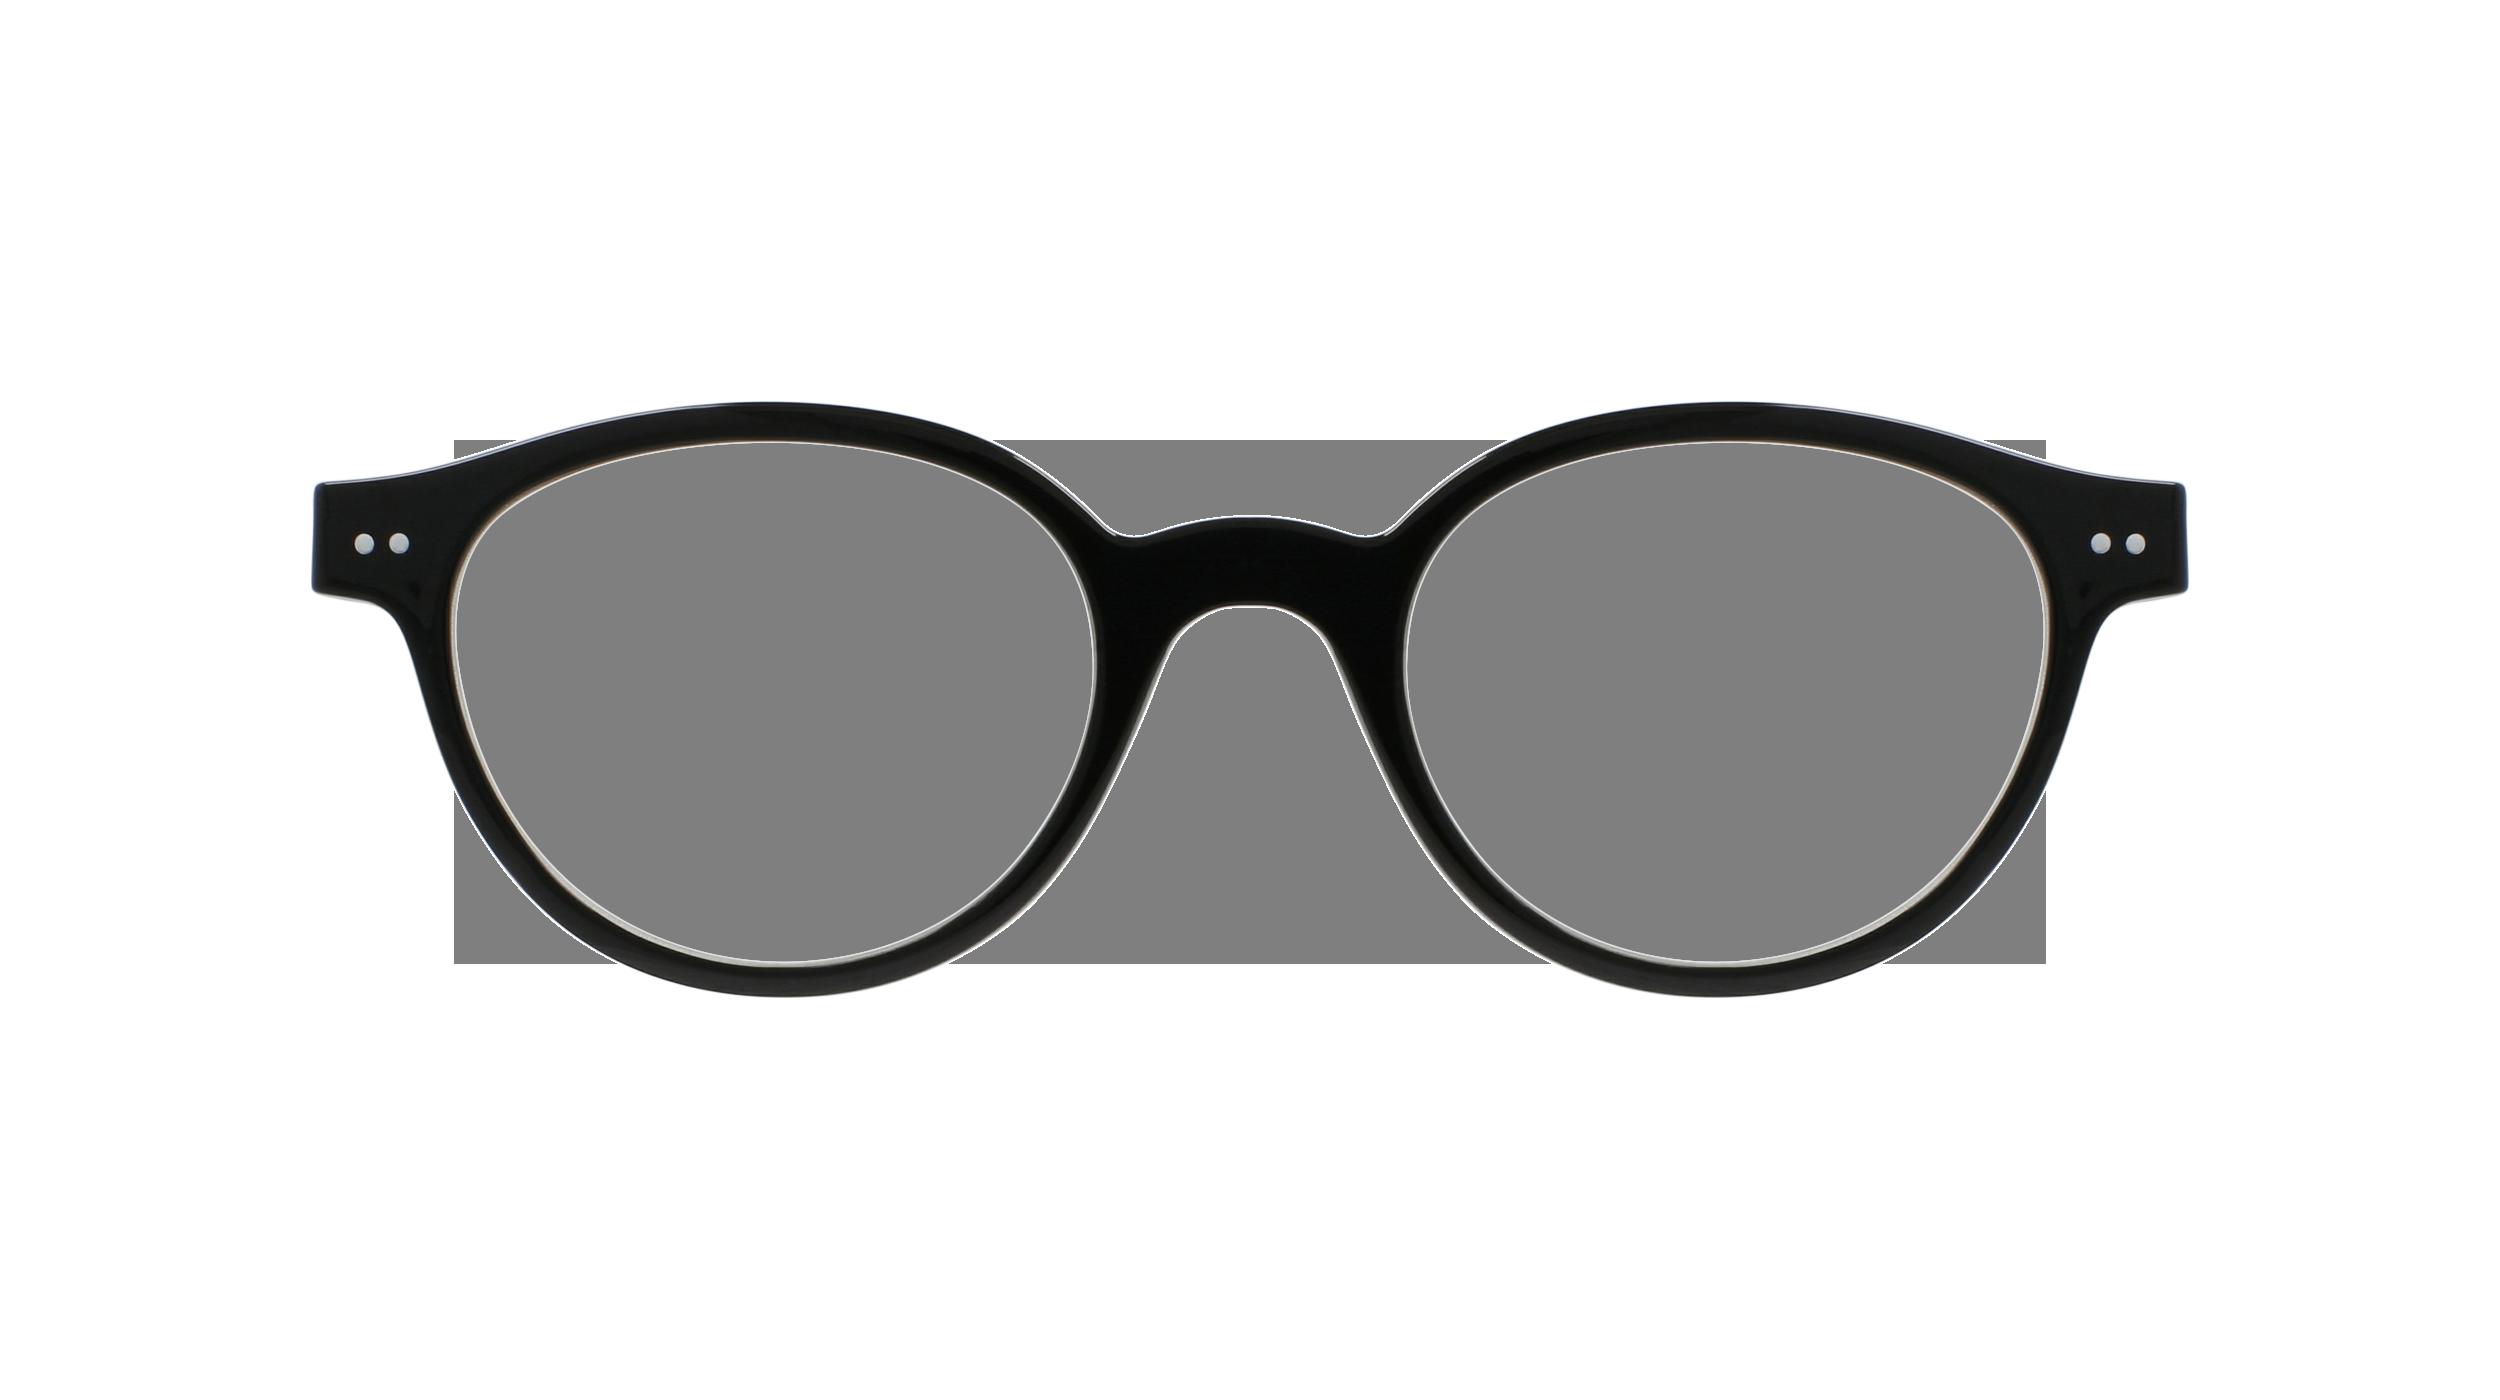 afflelou/france/products/smart_clip/clips_glasses/07630036429594.png